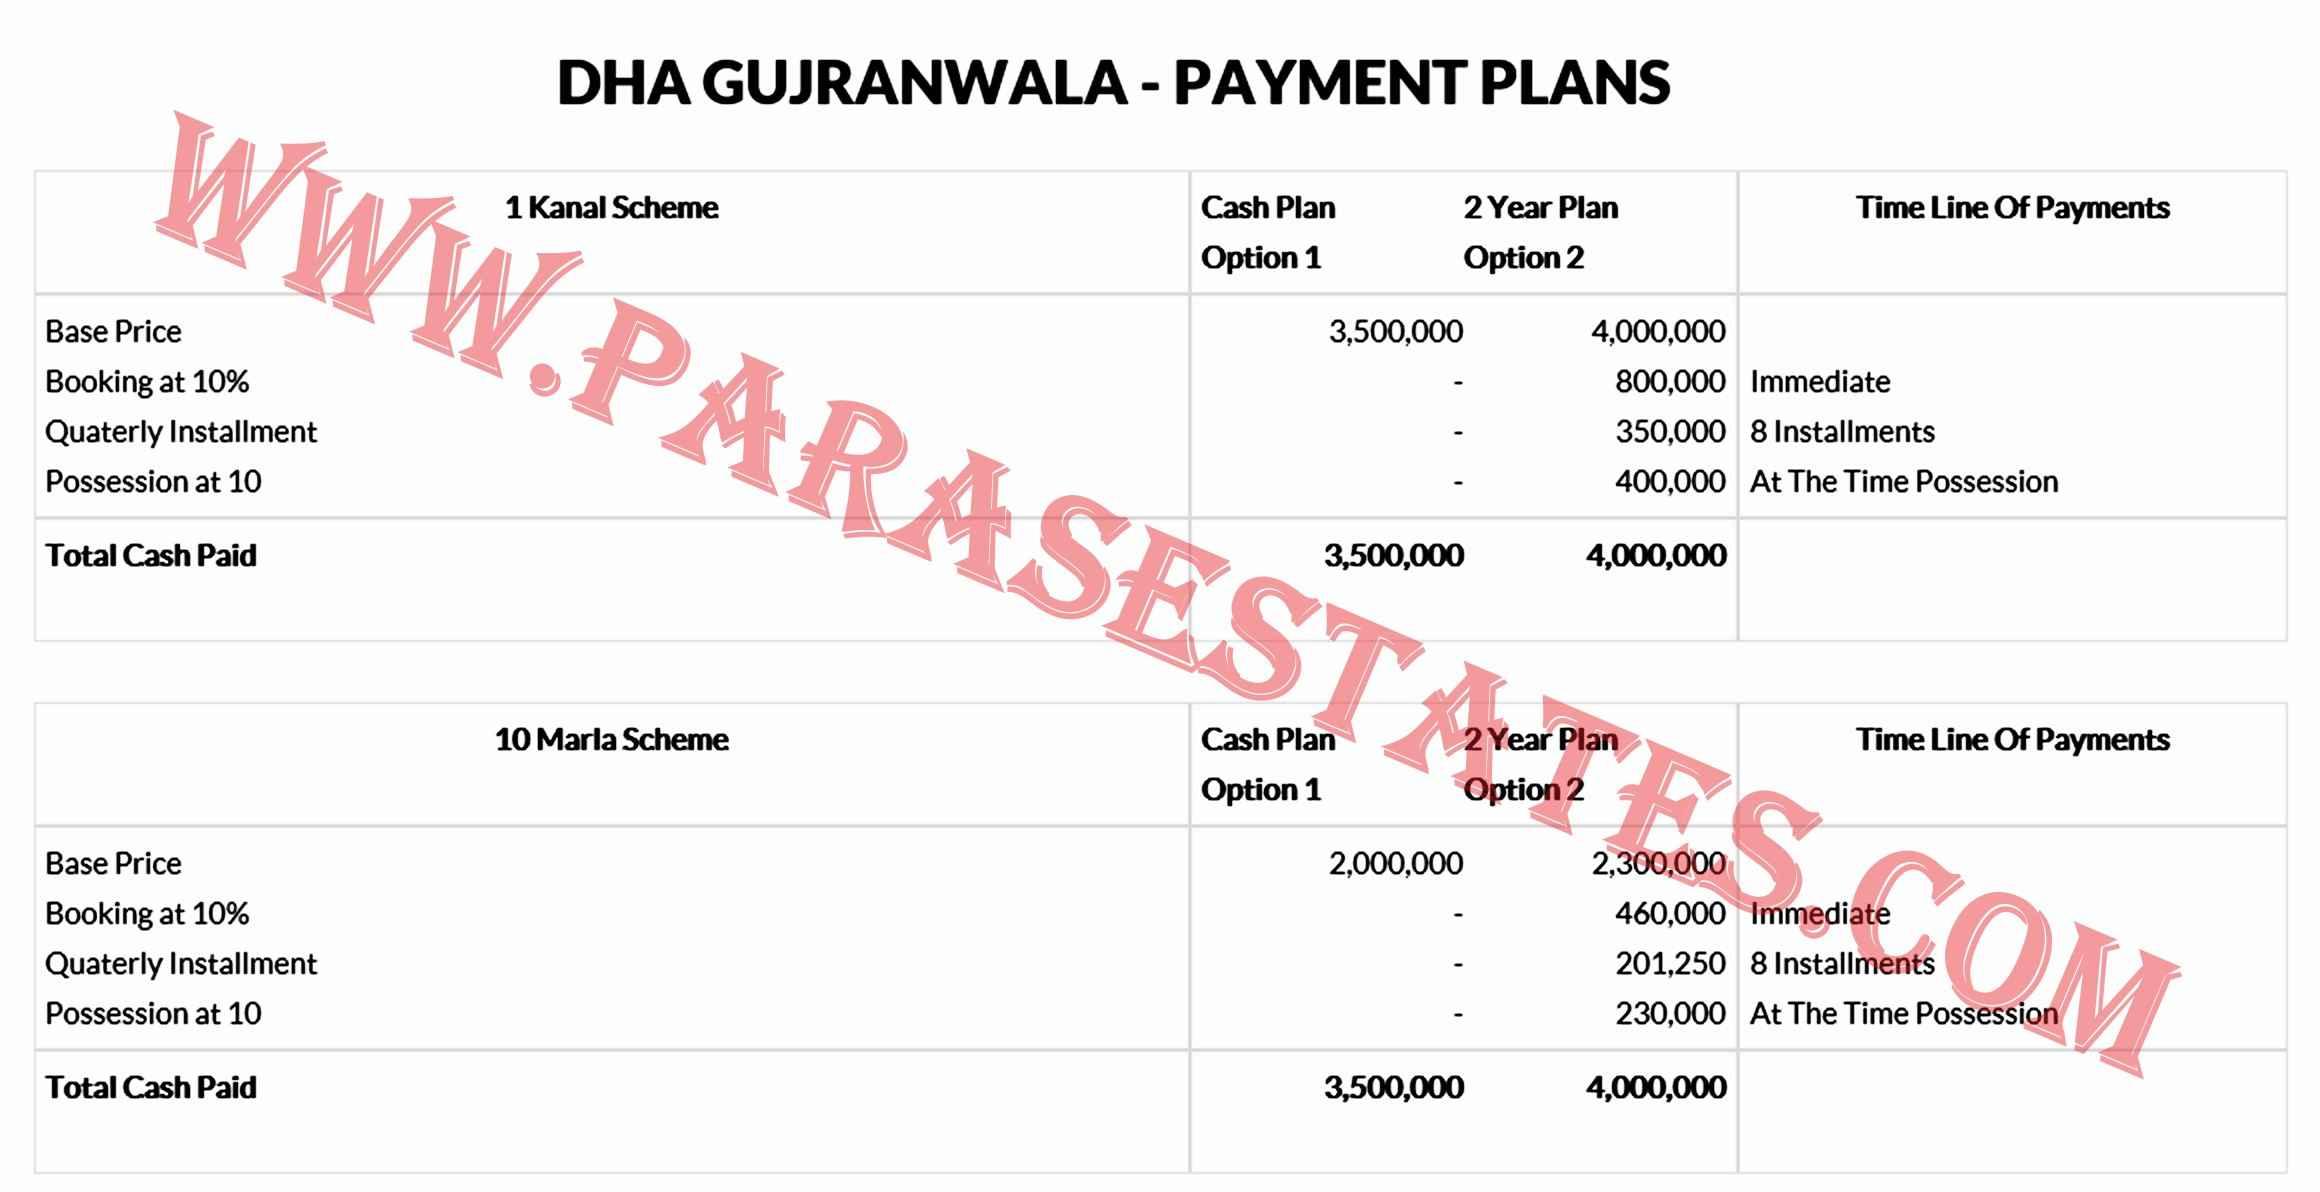 DHA Gujranwala Payment Plan